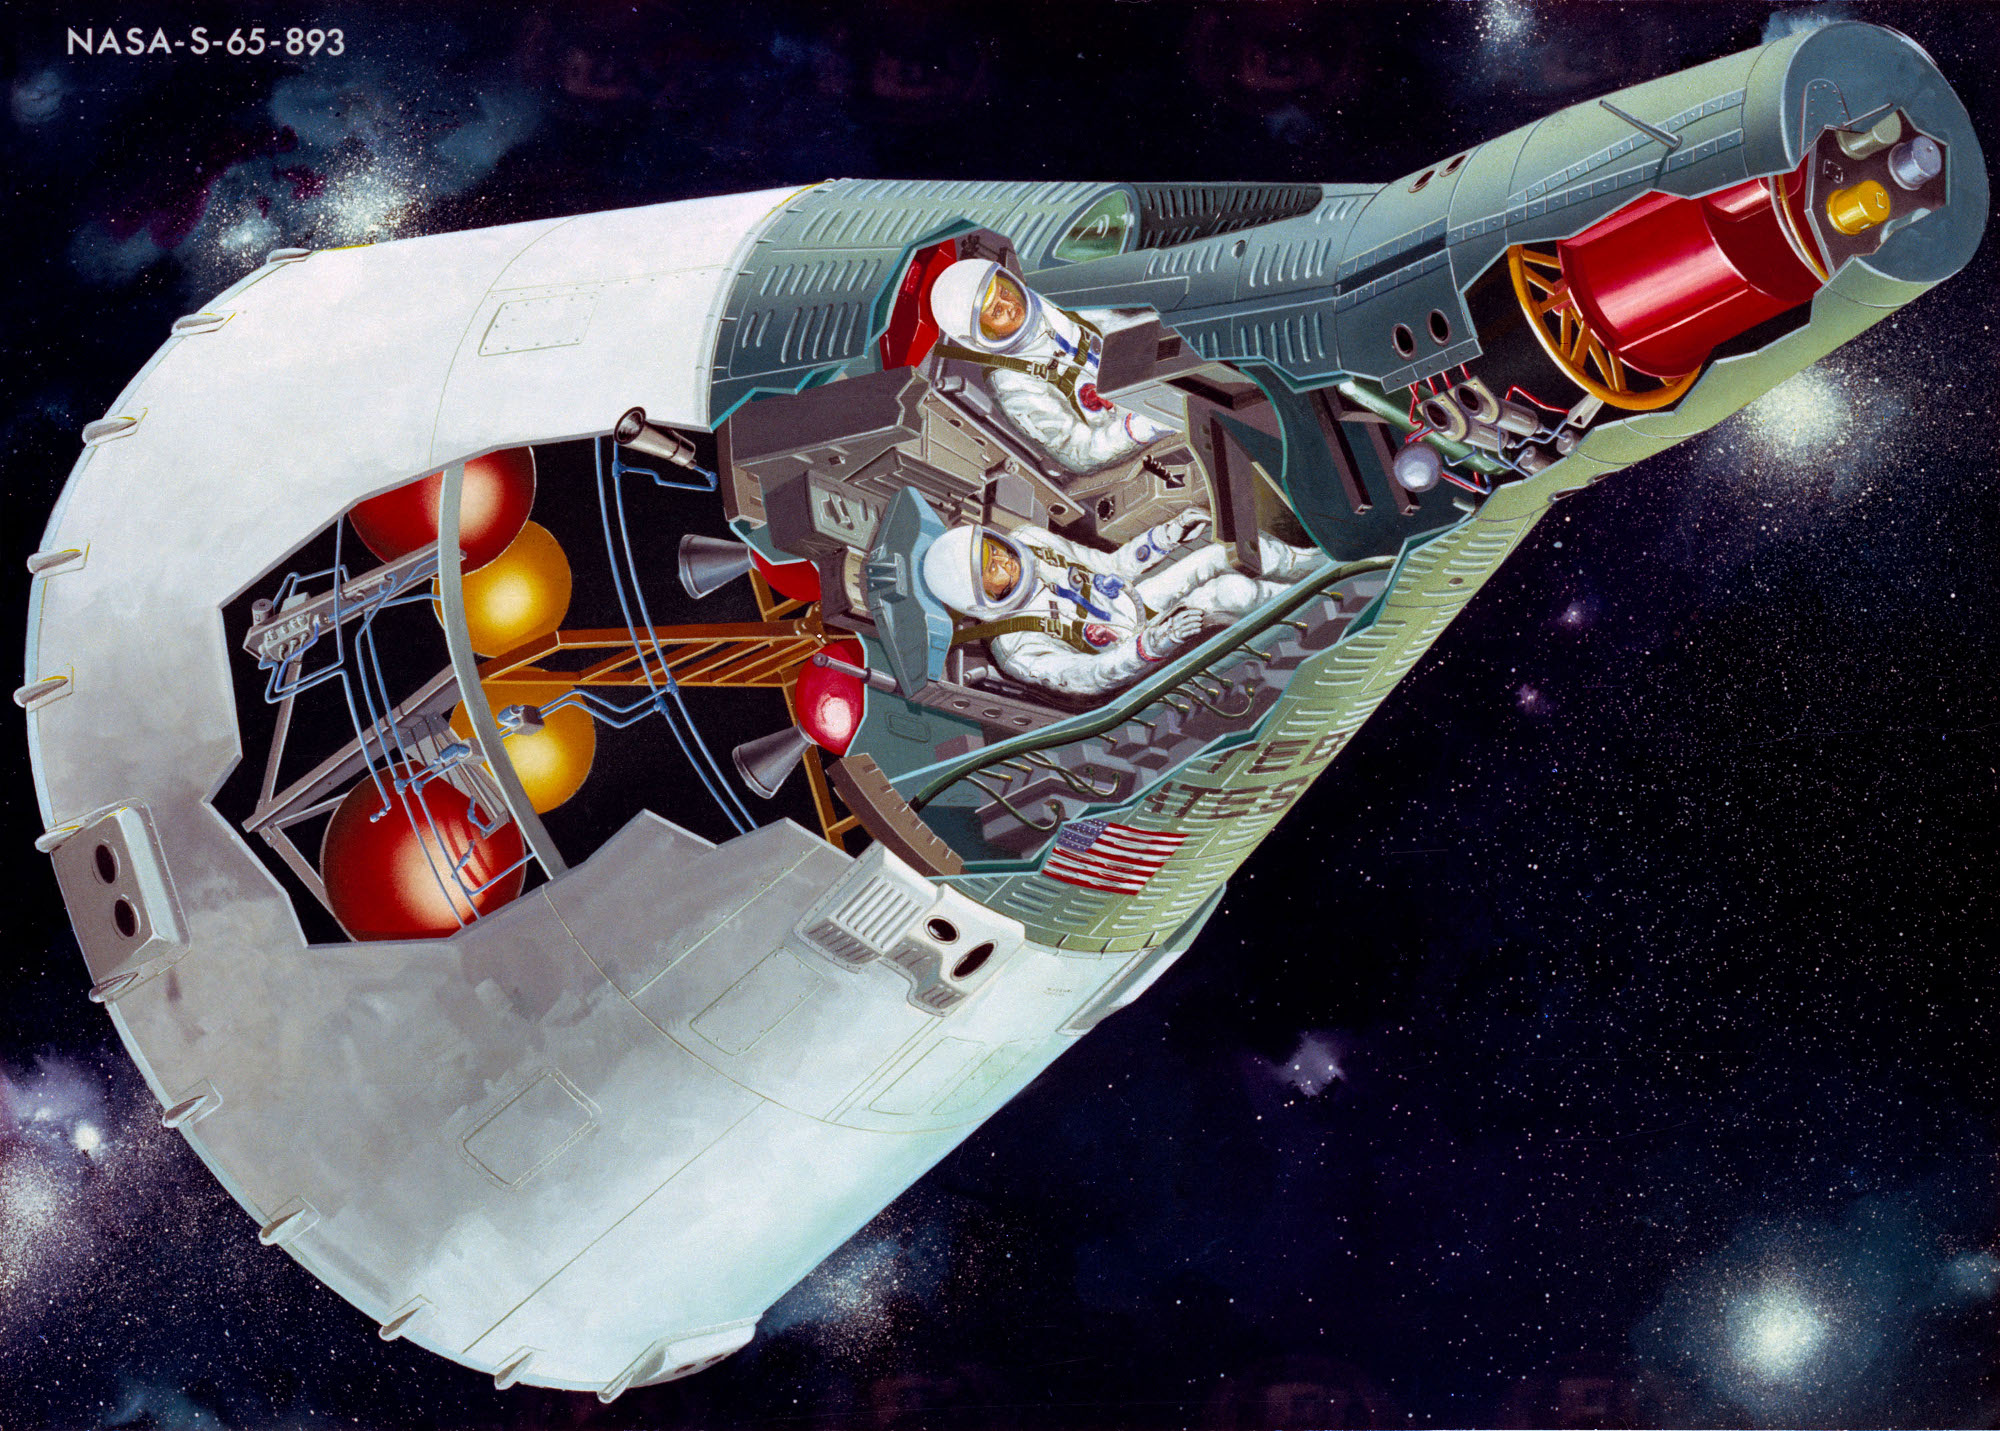 A cutaway illustration of the Gemini spacecraft